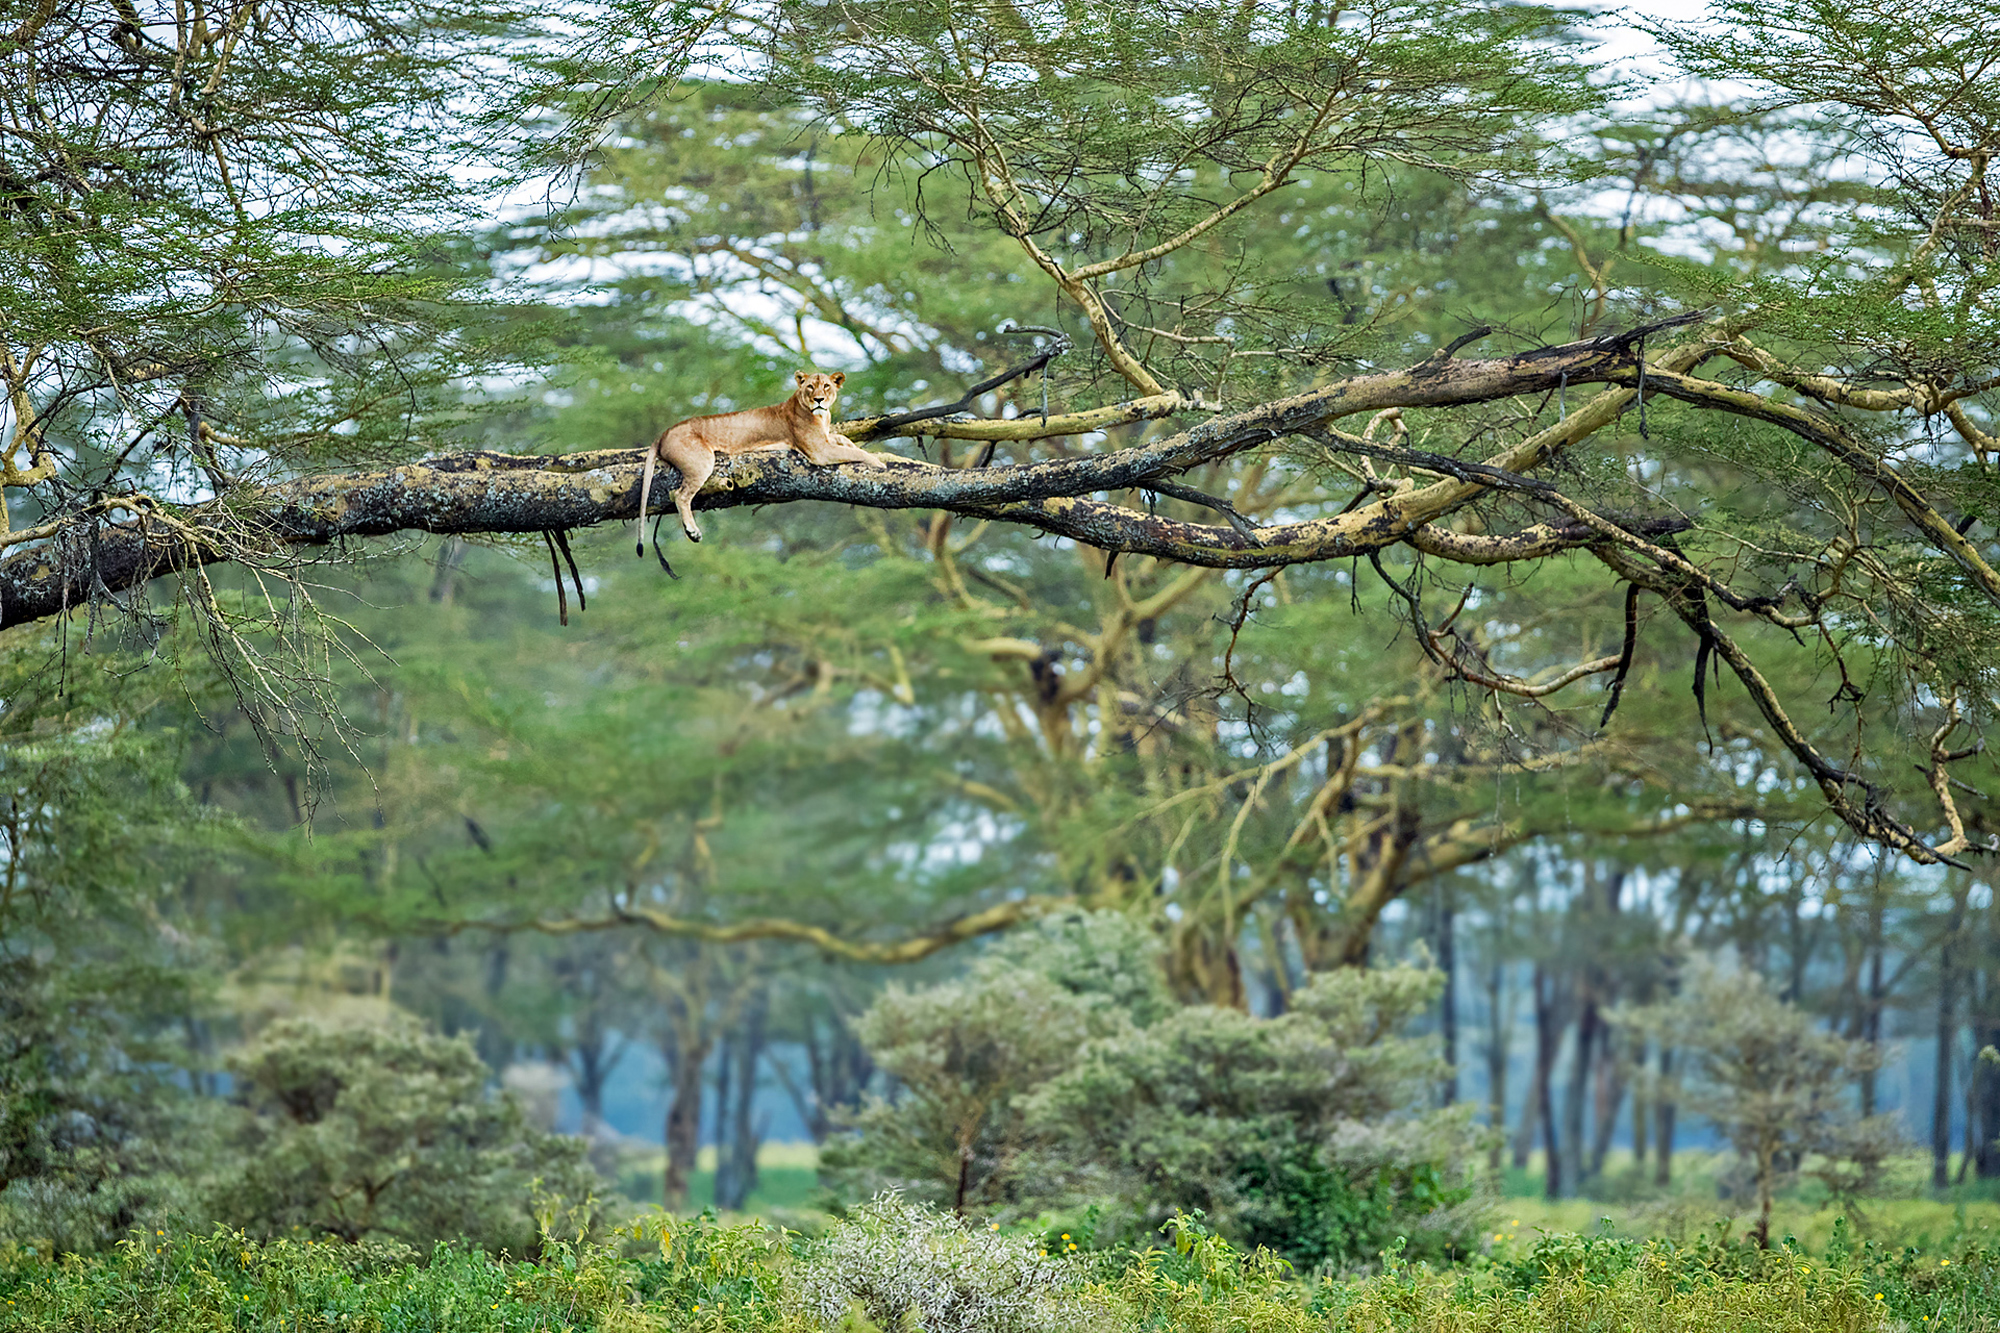 A lion rests in a tree in Lake Nakuru National Park, Kenya